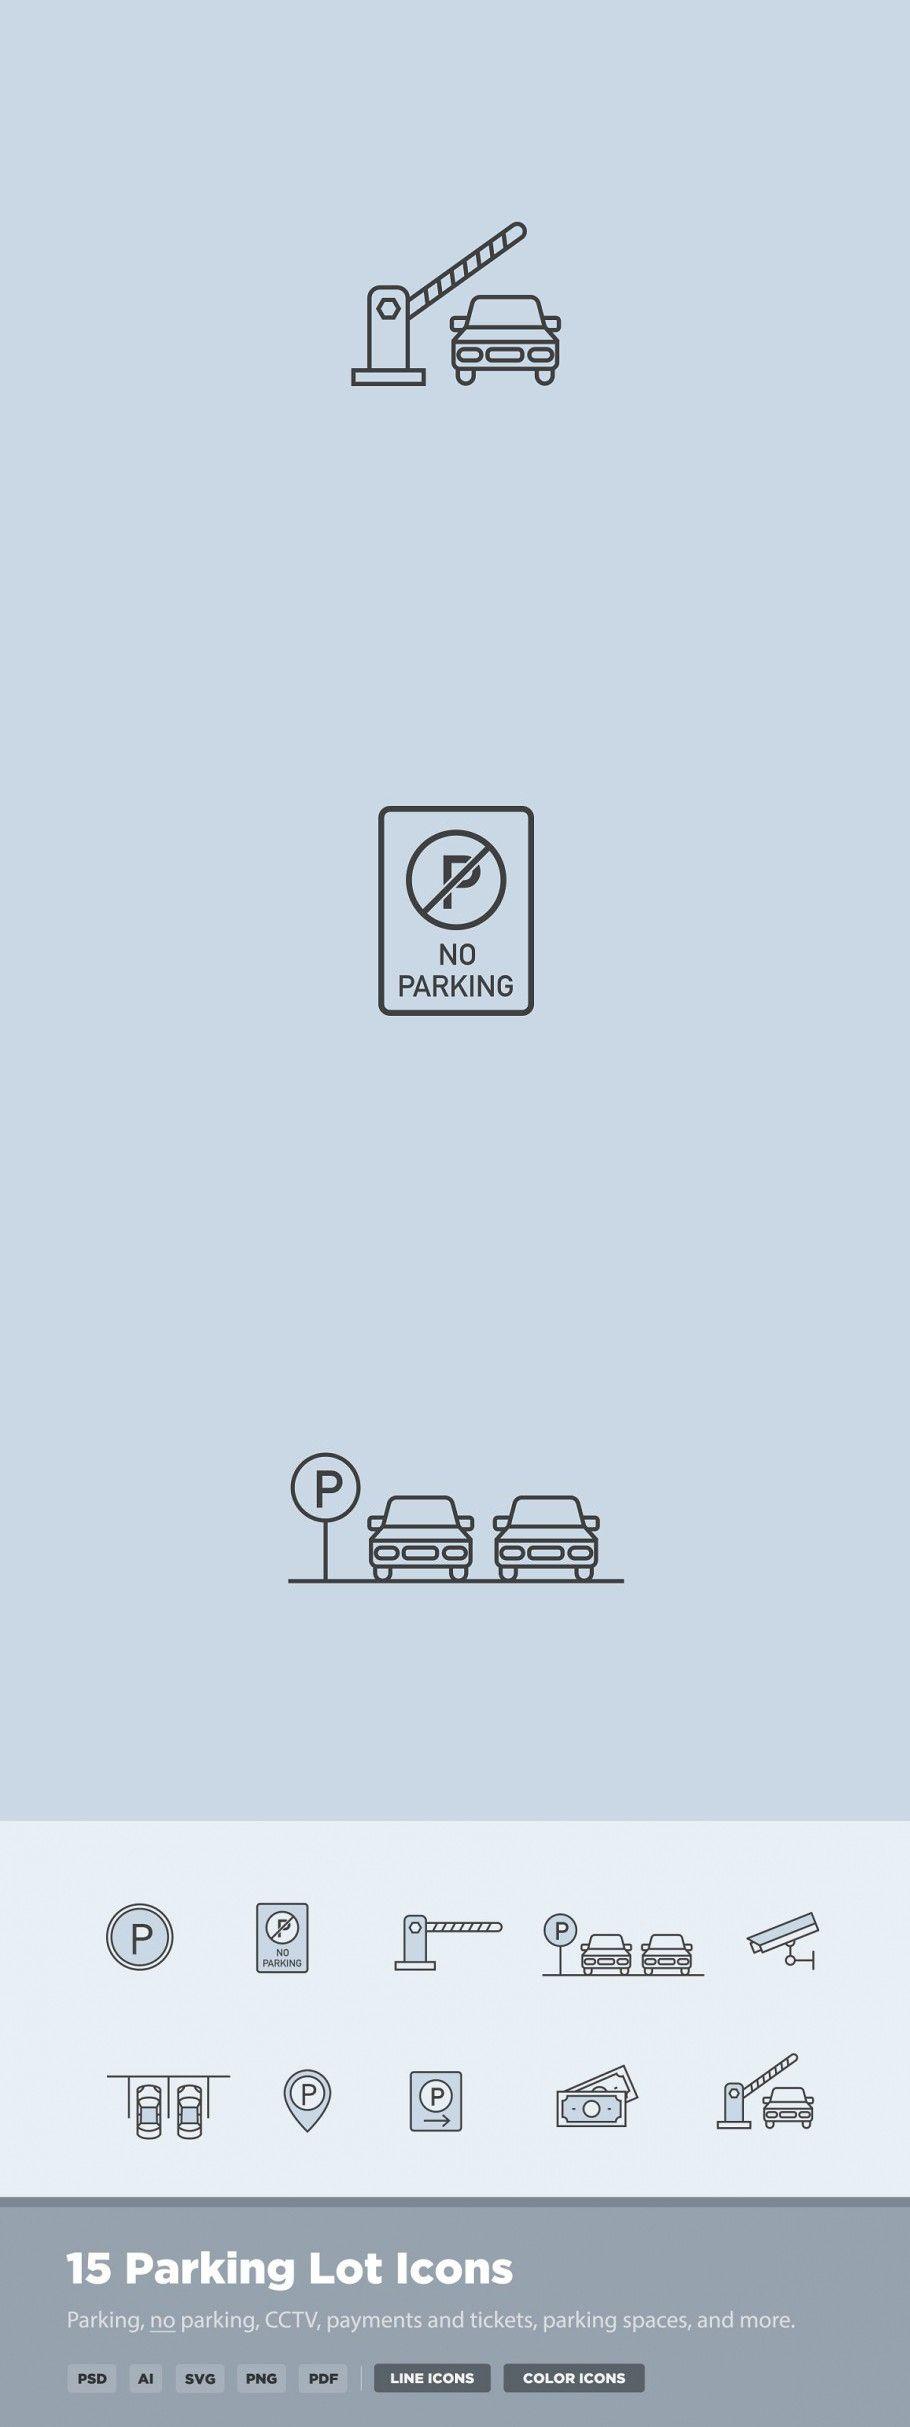 15 Parking Lot Icons Parking Design Icon Parking Lot